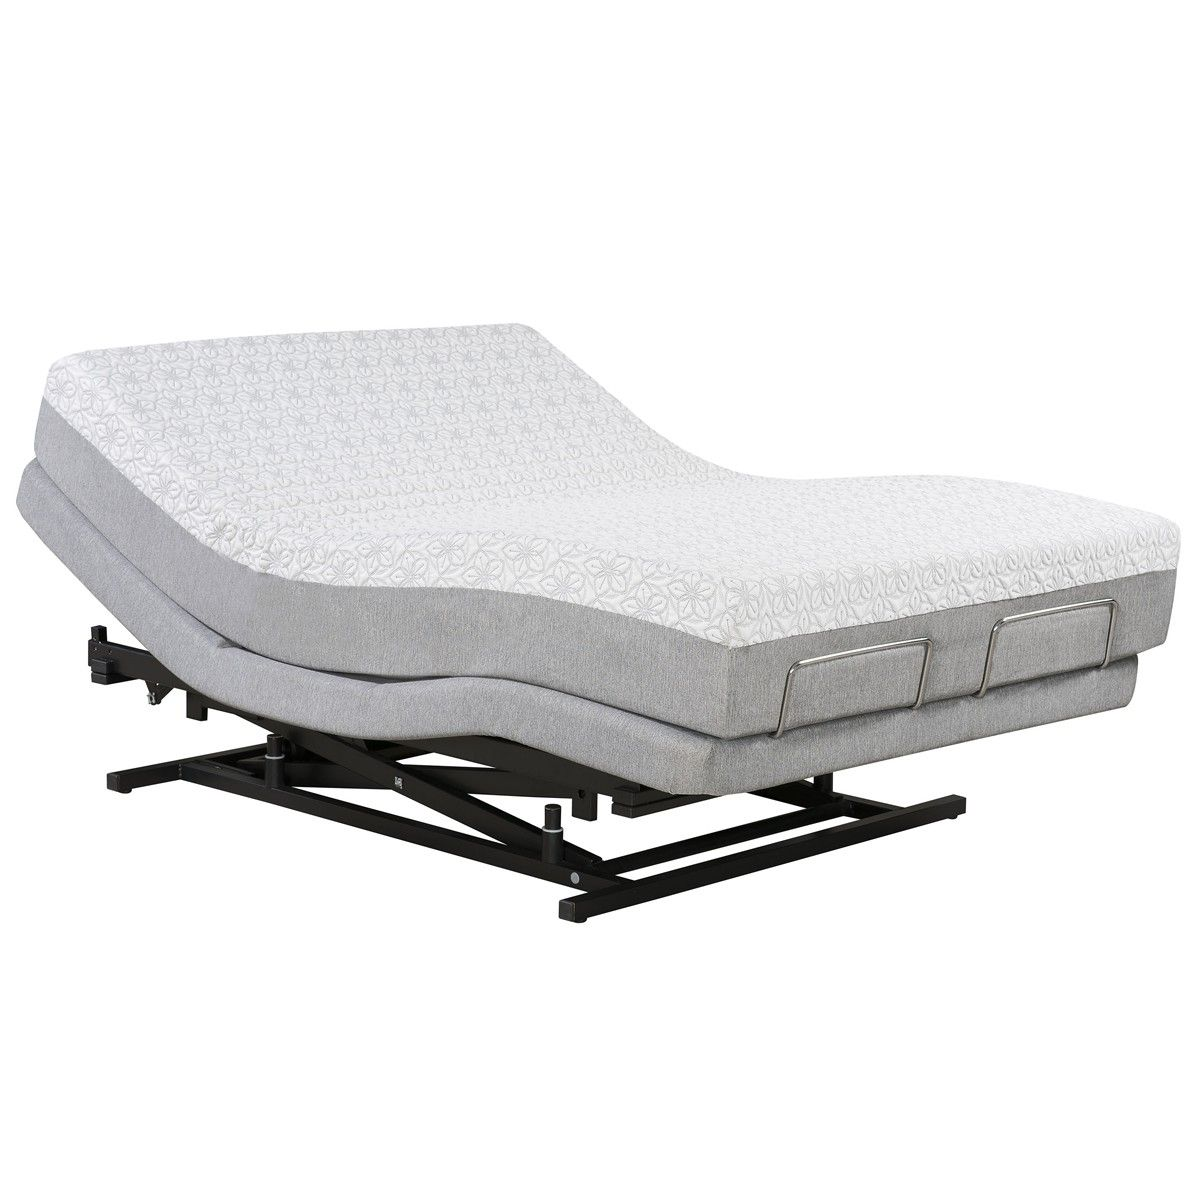 Kalmia Perfect Height Hi Low Adjustable Bed Adjustable Beds Low